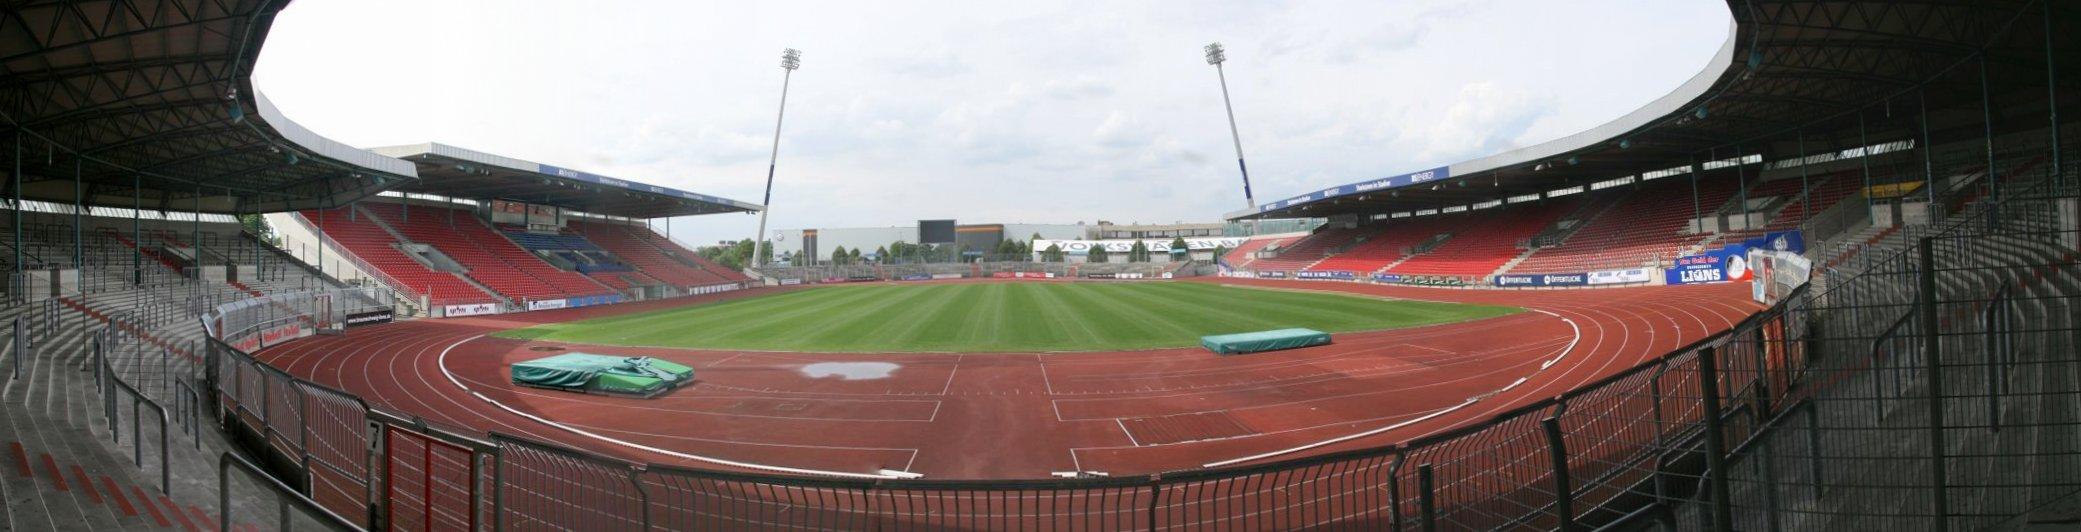 Eintracht-stadion-panorama.jpg